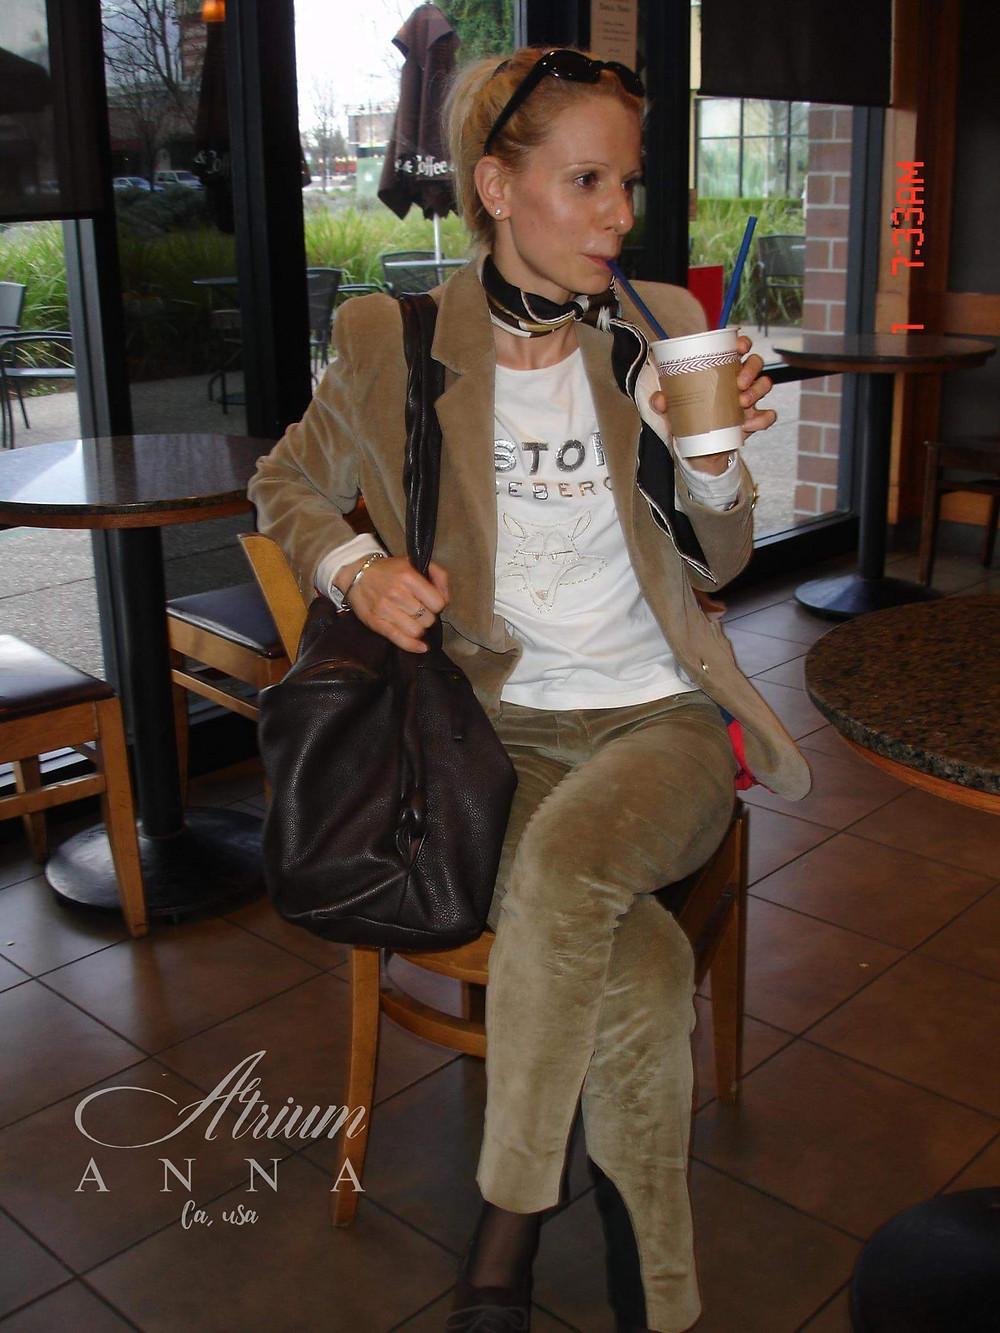 Anna Haeven, Founder and CEO of Atrium Anna Vintage Luxury